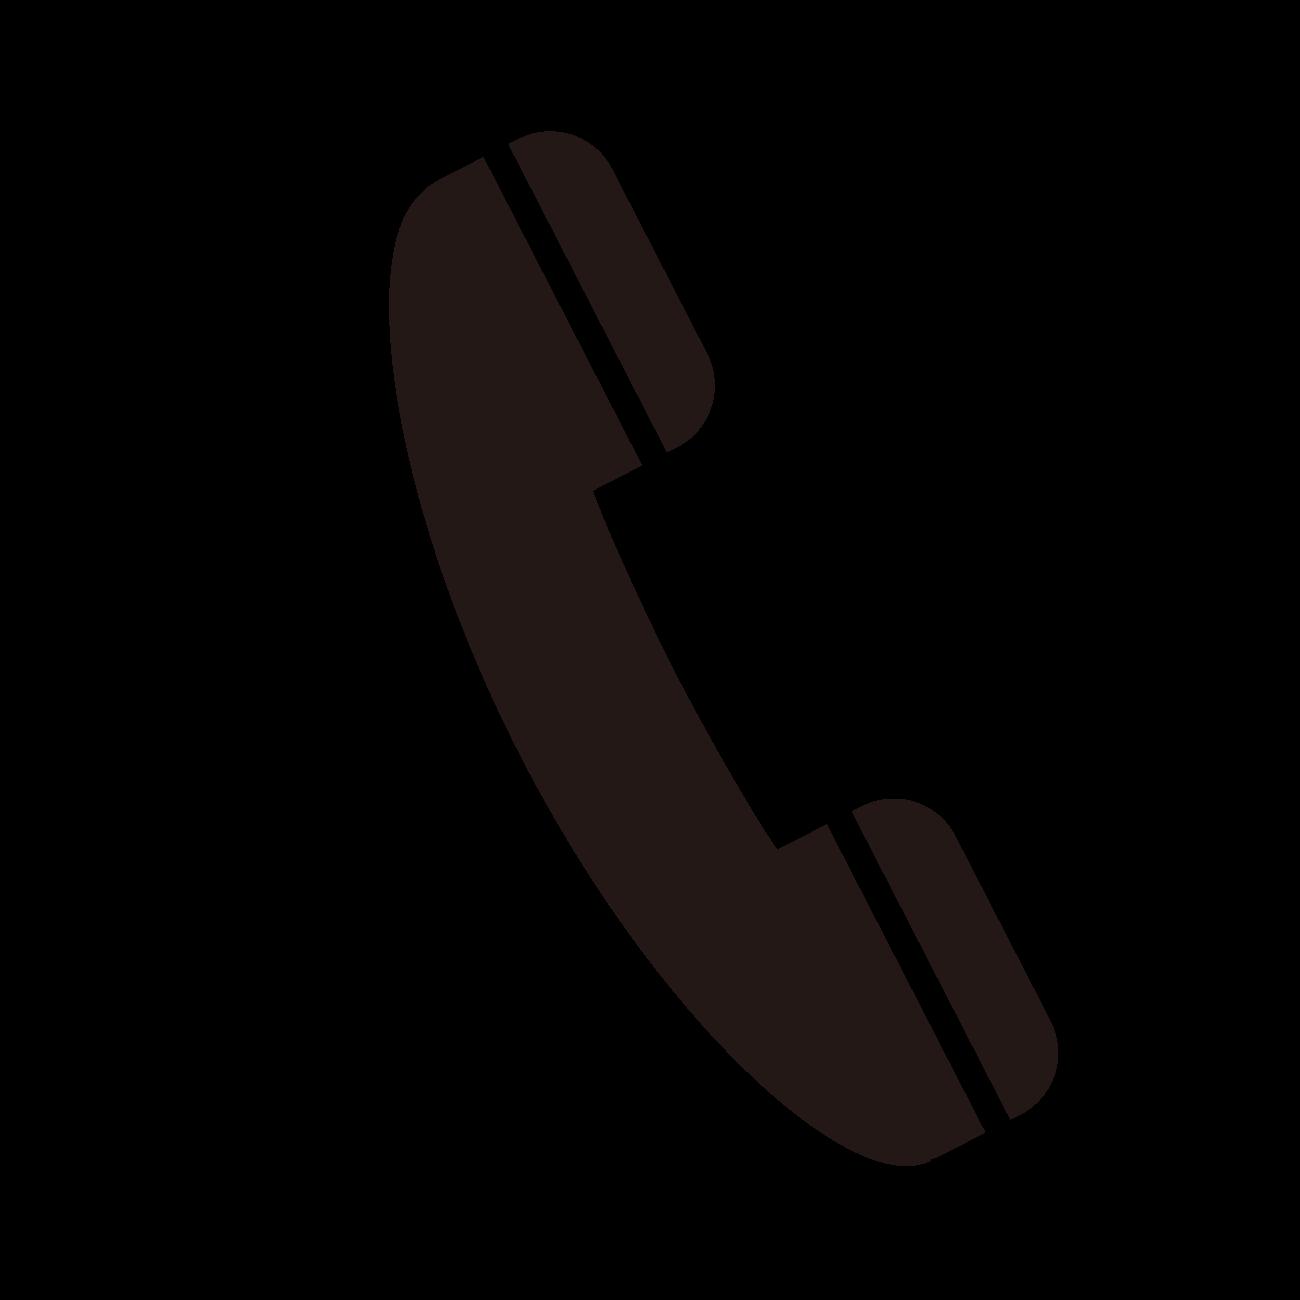 tellephone